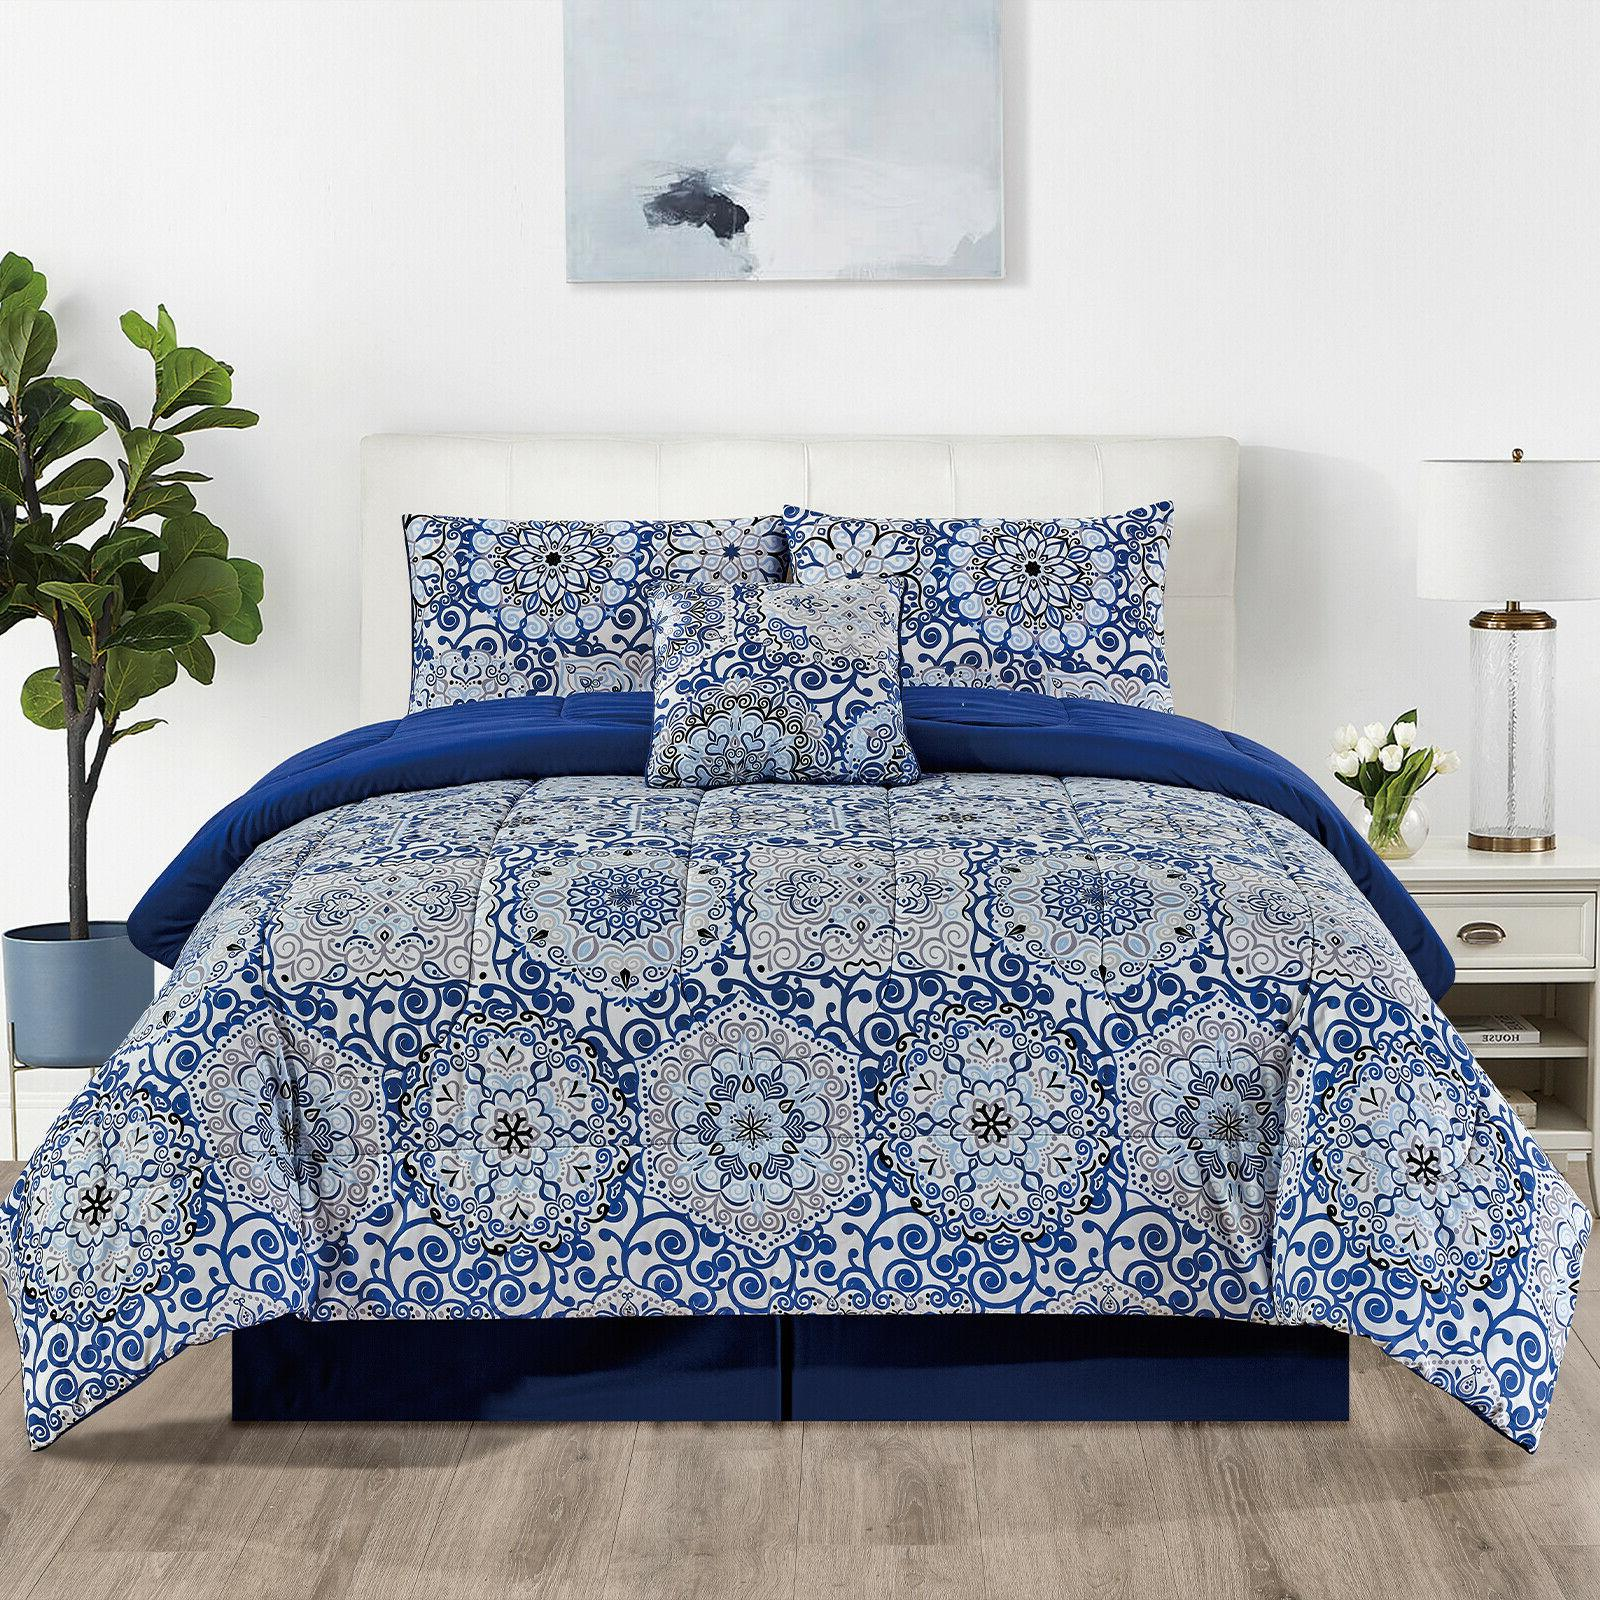 Duvet Insert 5 Piece Reversible Comforter Set Ultra Soft Mic